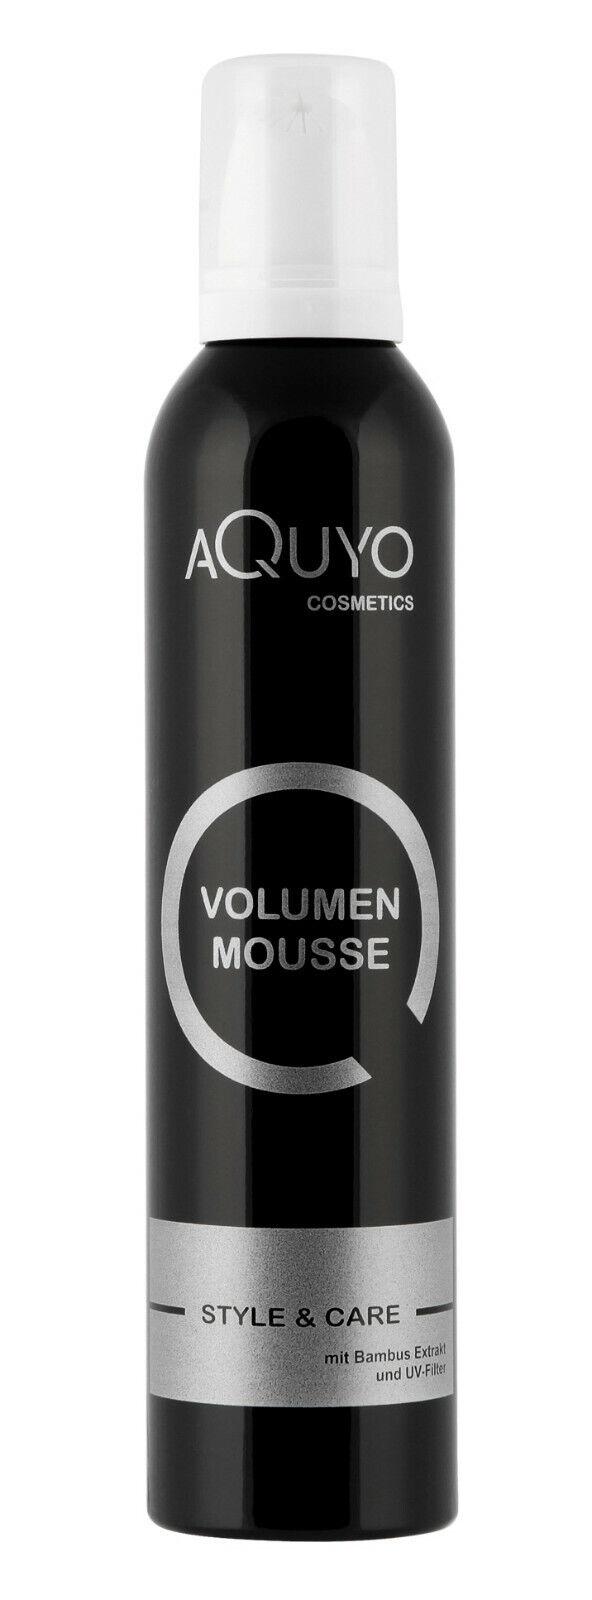 Volumen Mousse Haarschaum Schaum Styling Haare Volumenmousse Schaumfestiger